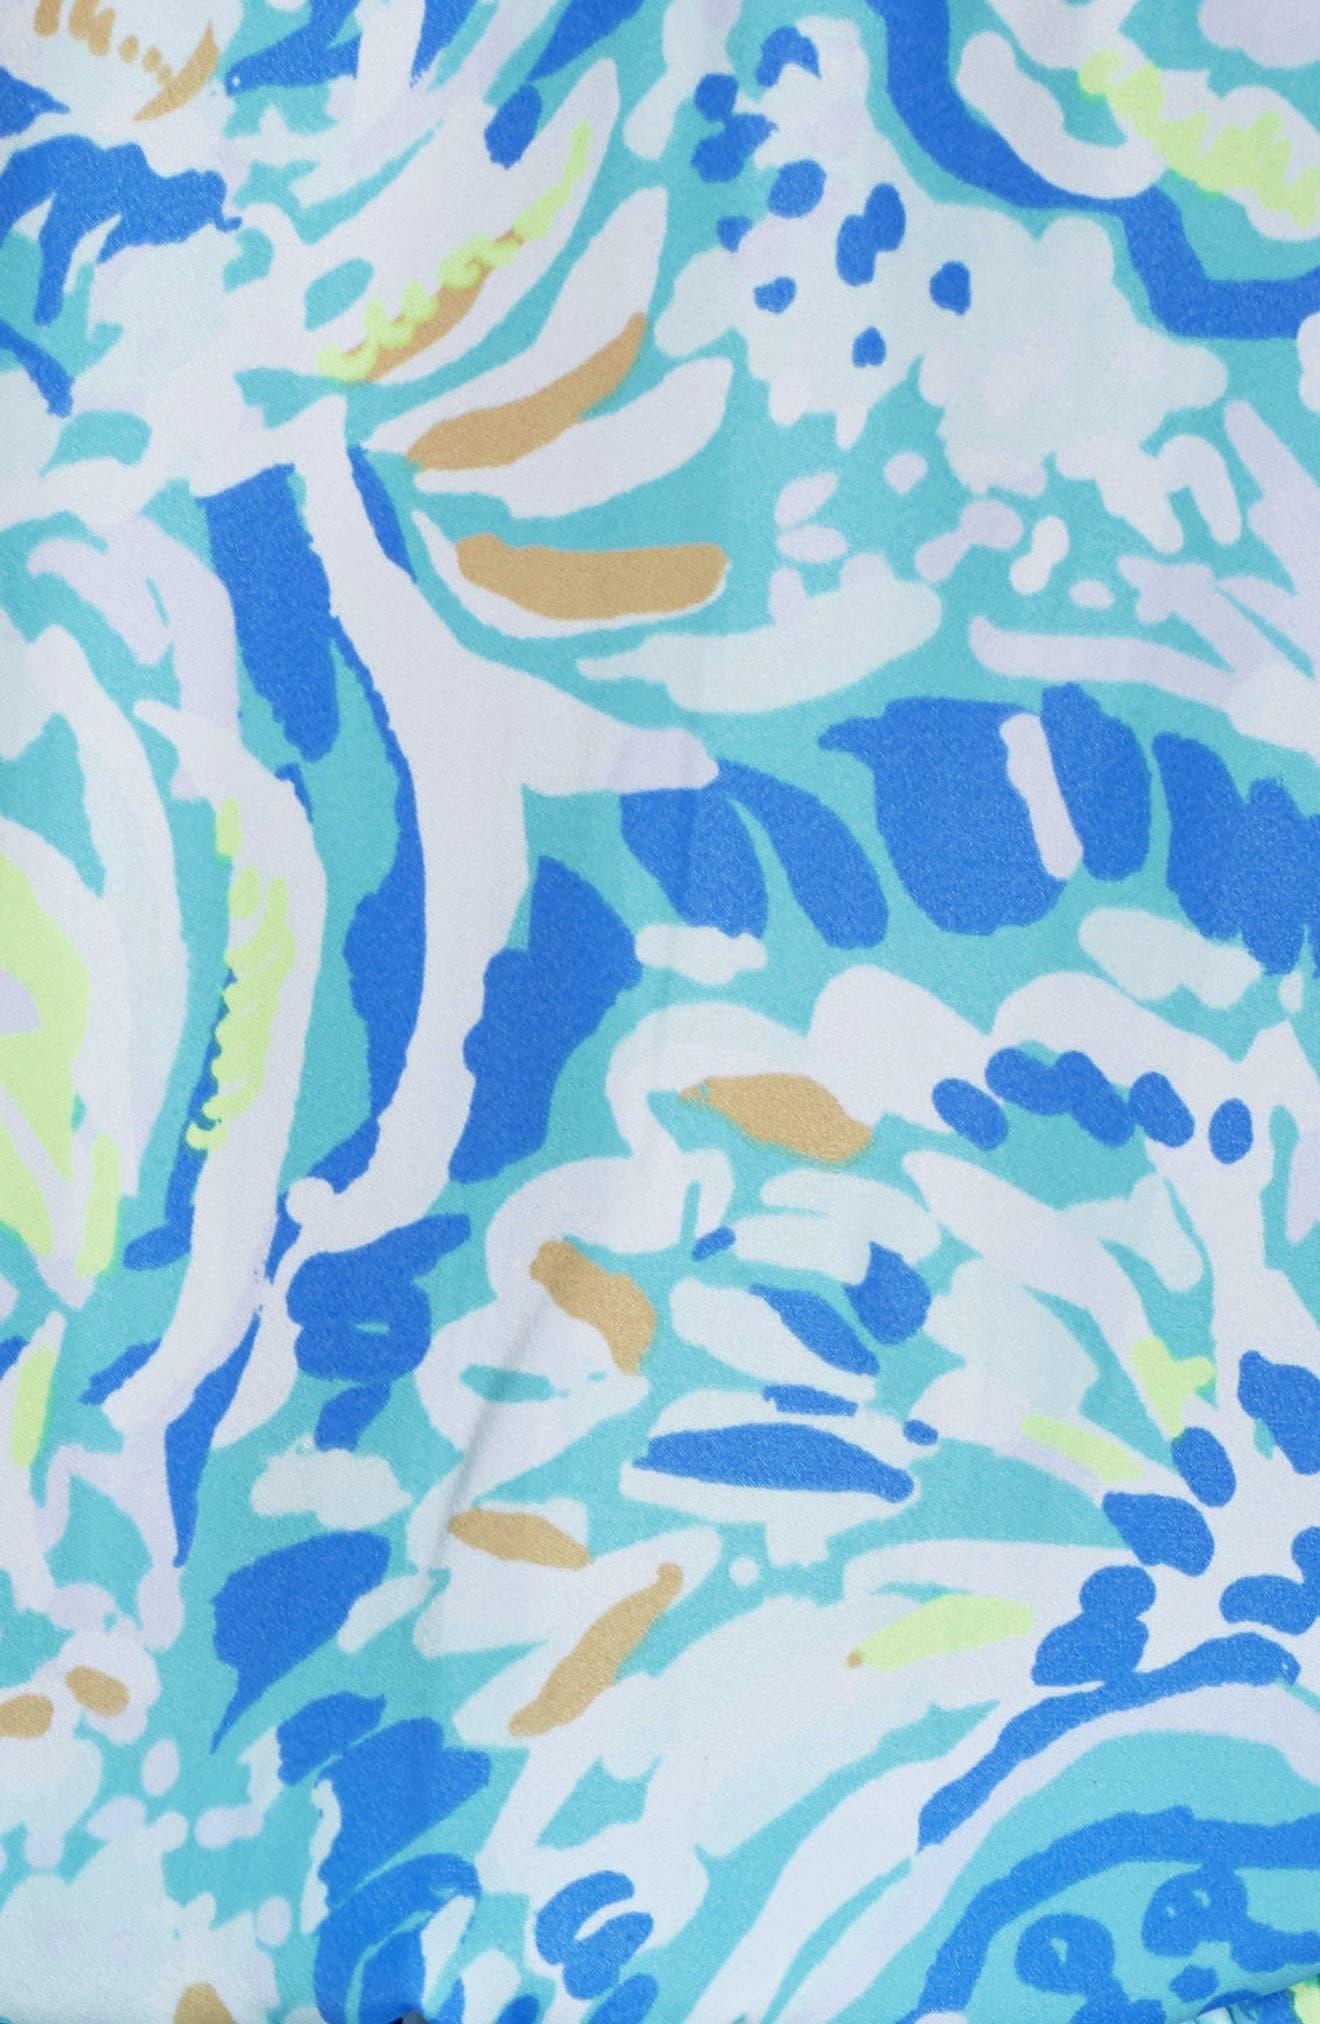 Deanna Sleeveless Romper,                             Alternate thumbnail 5, color,                             BENNET BLUE SALTY SEAS